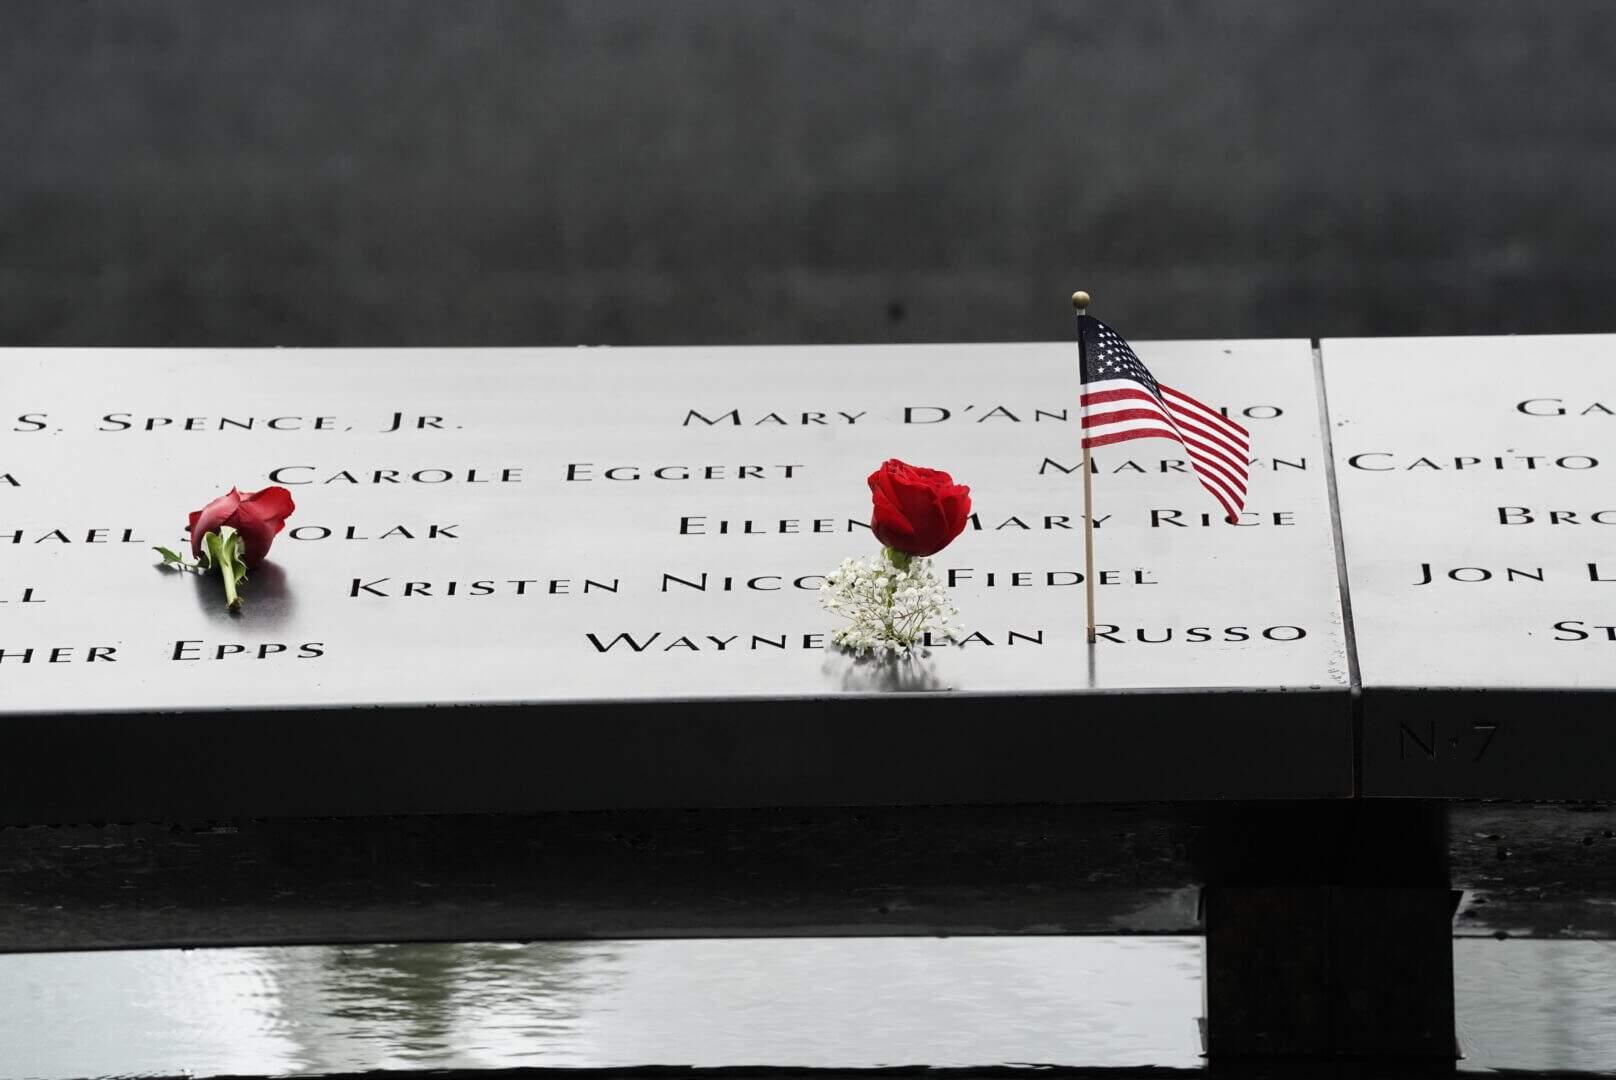 Atentados do 11 de setembro nos Estados Unidos